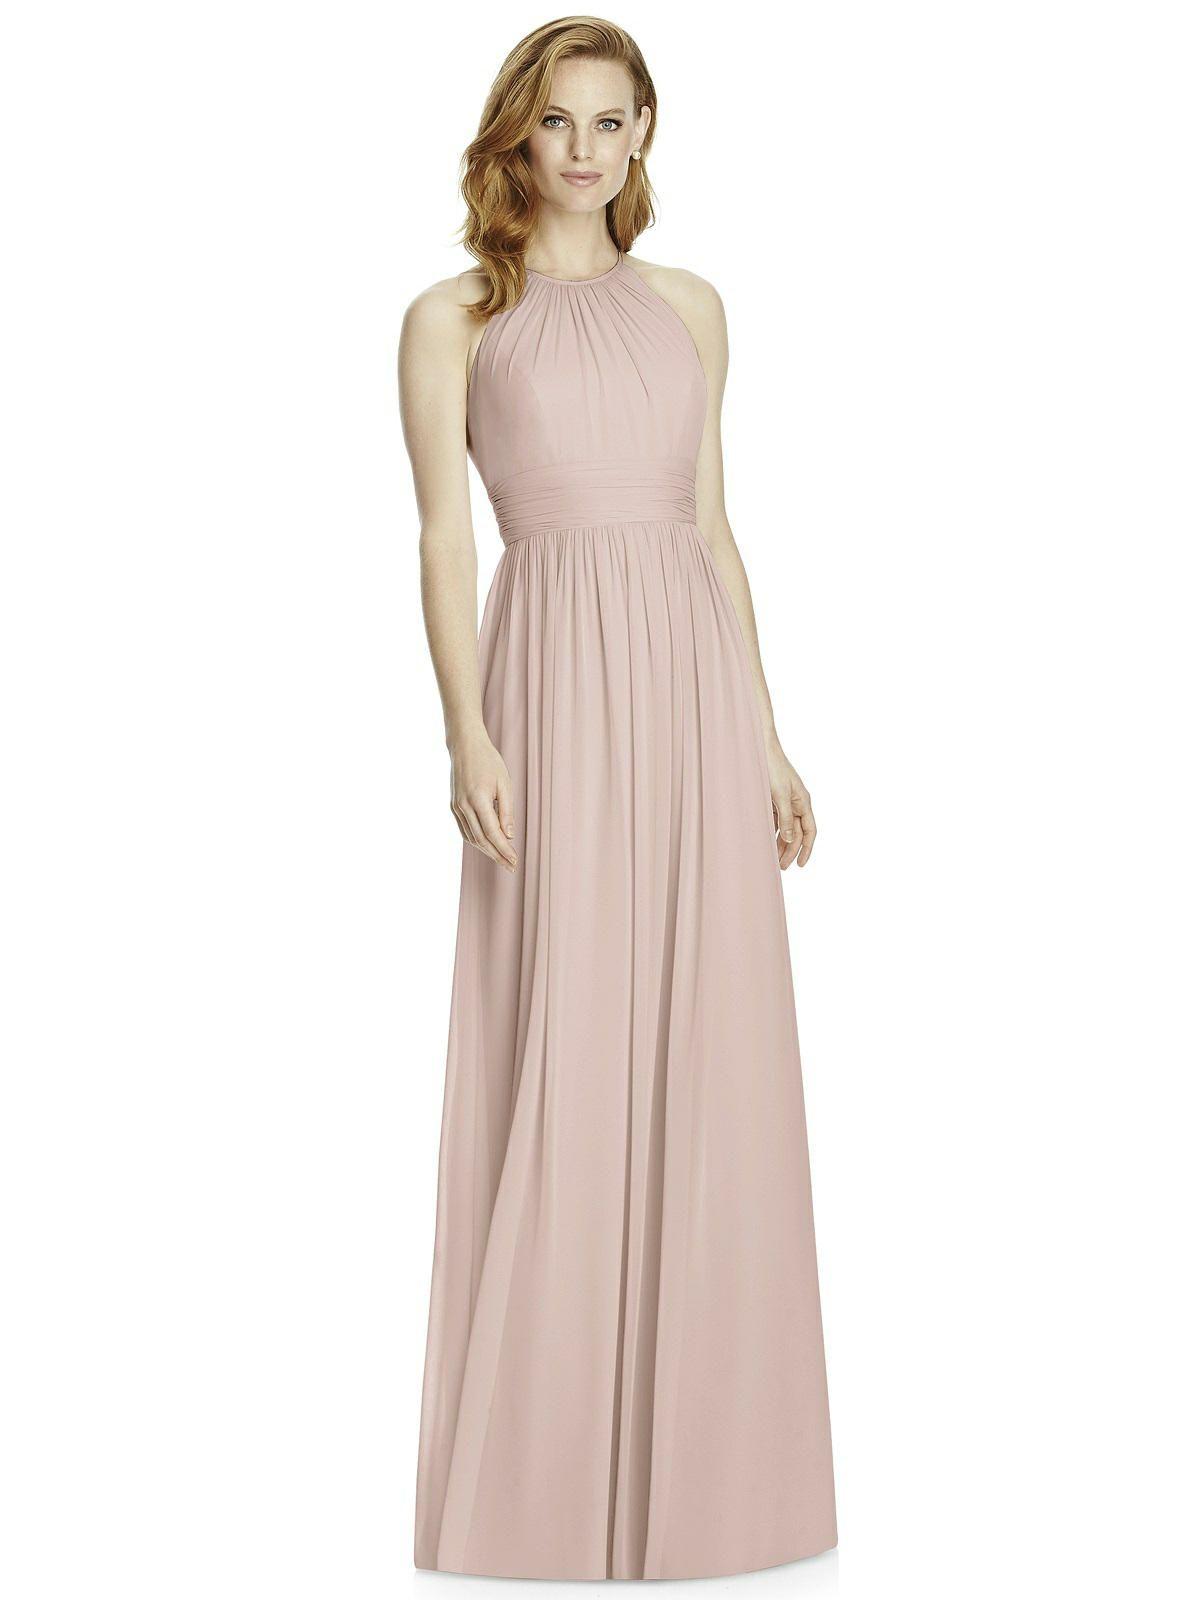 40b7c9491b Studio Design Collection 4511 Full Length Halter Neckline Bridesmaid Dress